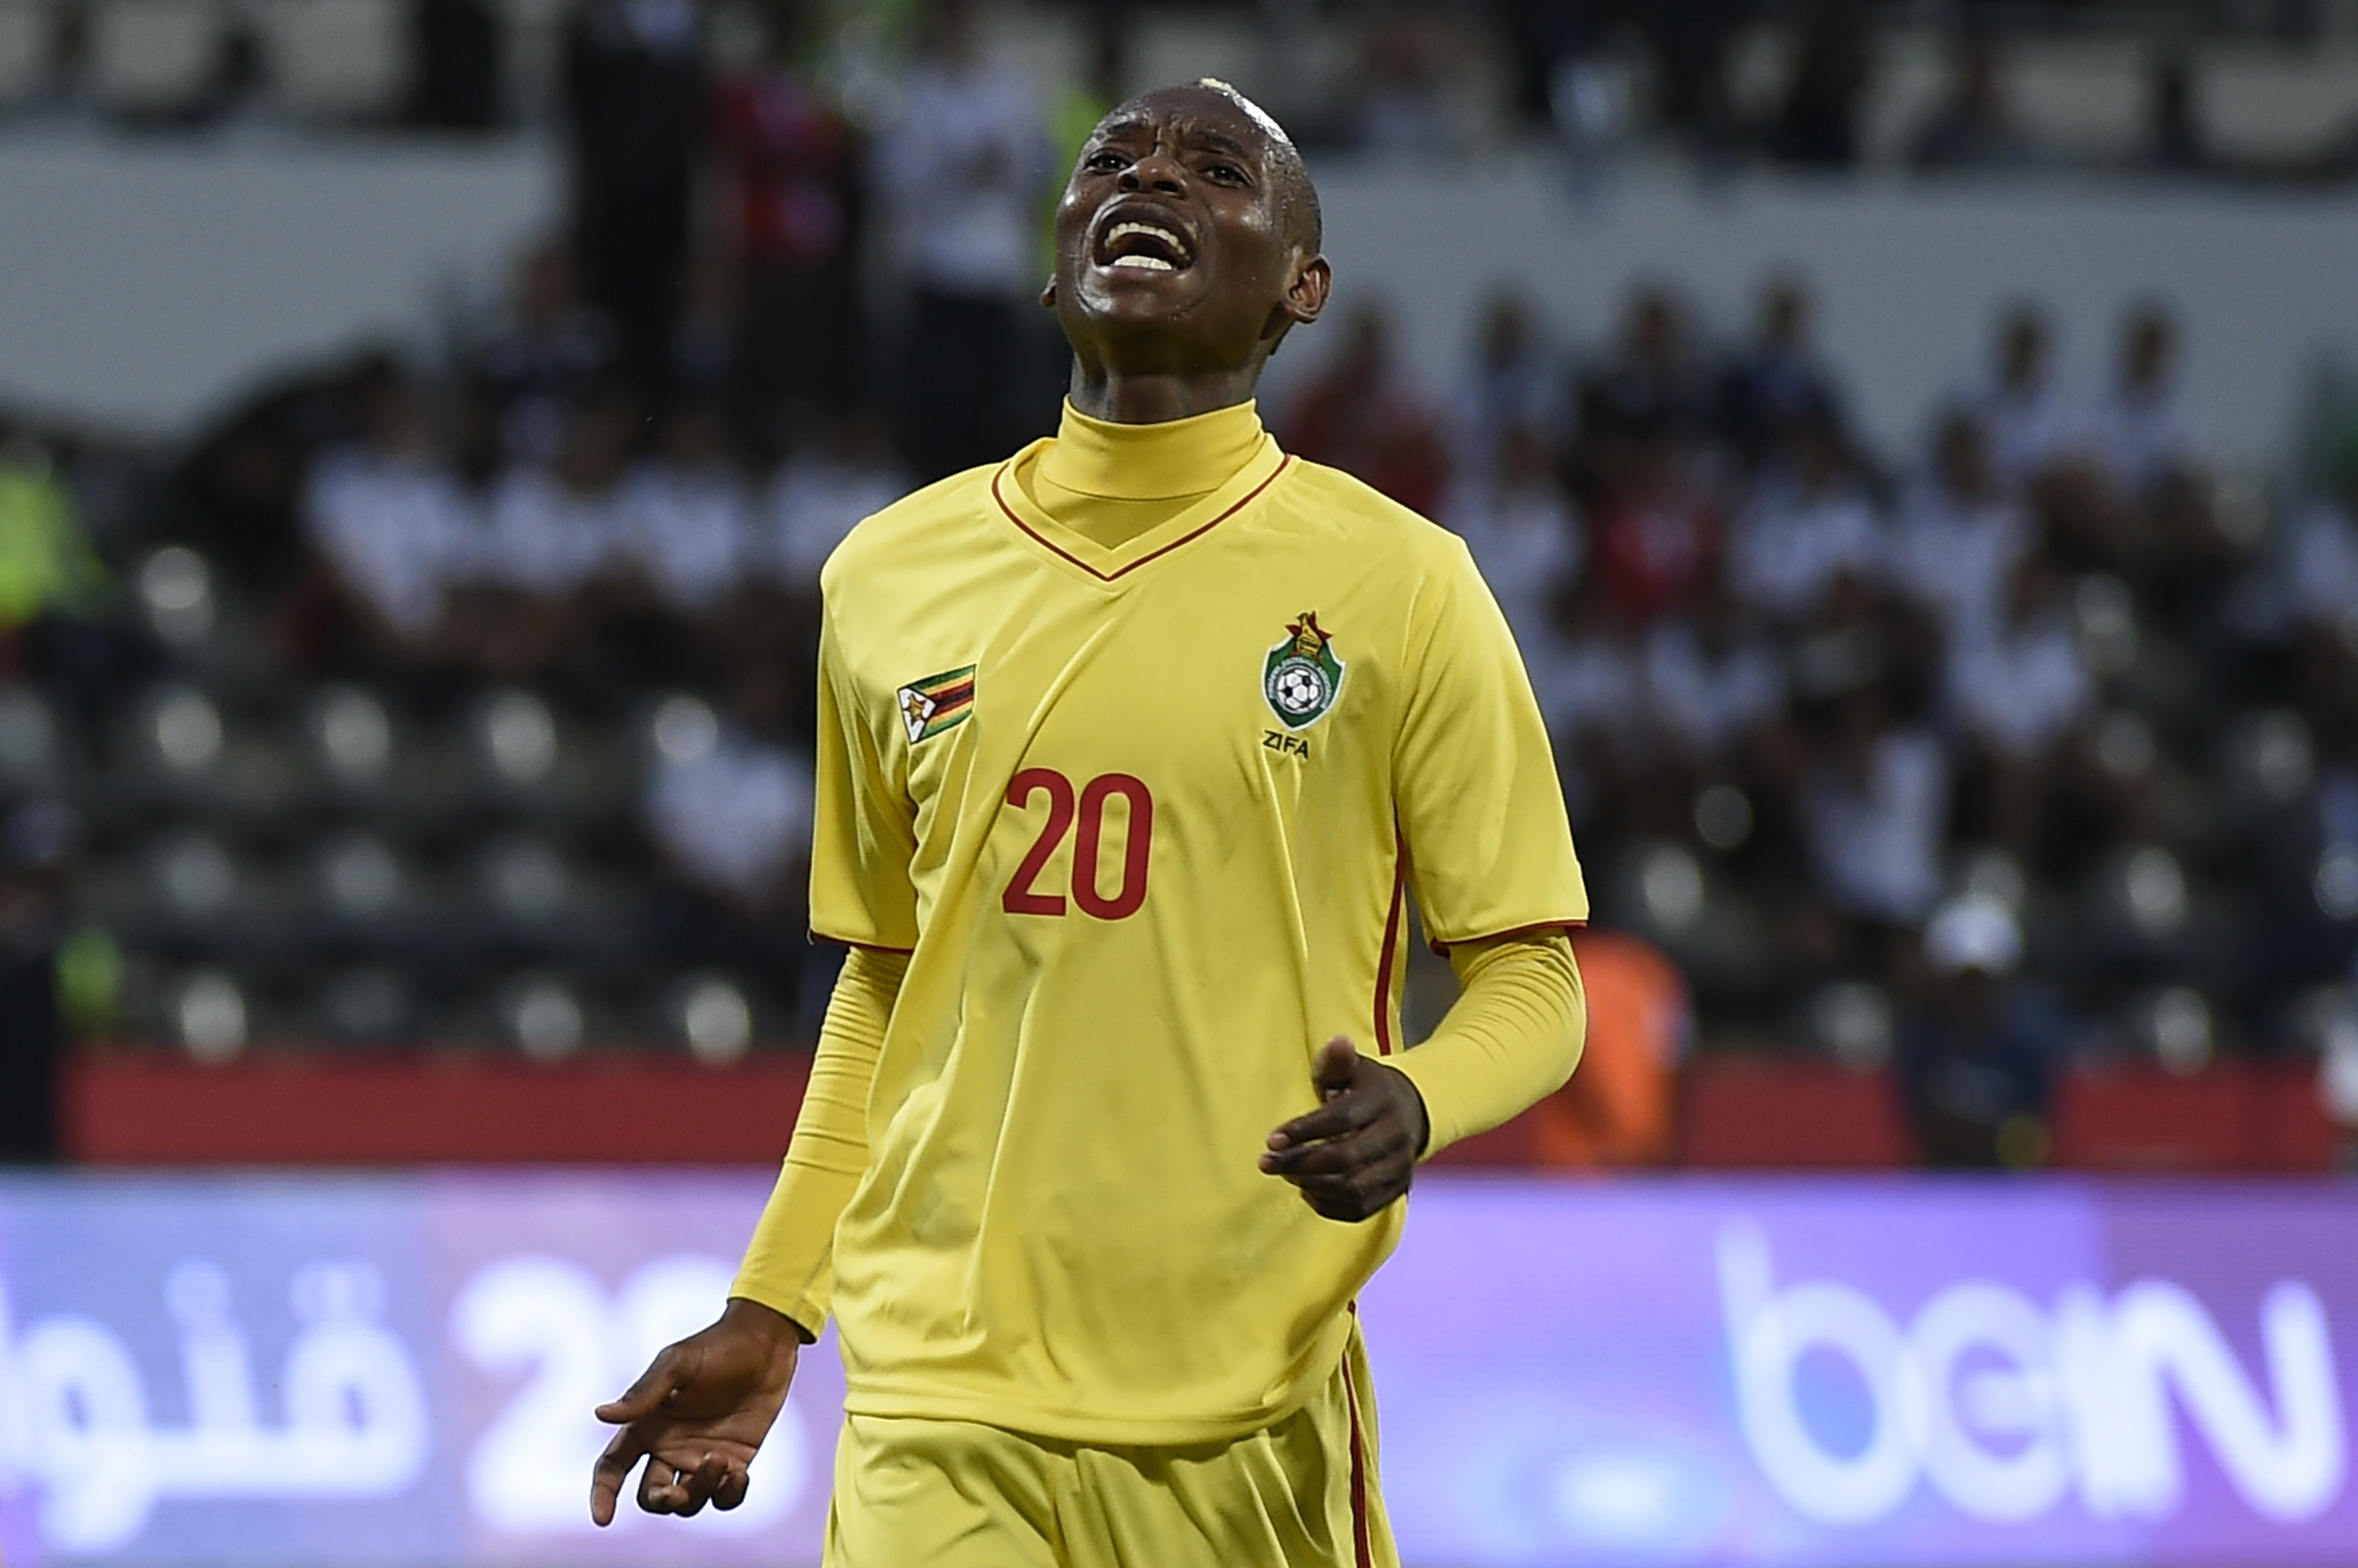 Cosafa Cup Semi-final Review: Zimbabwe and Zambia set up date for final